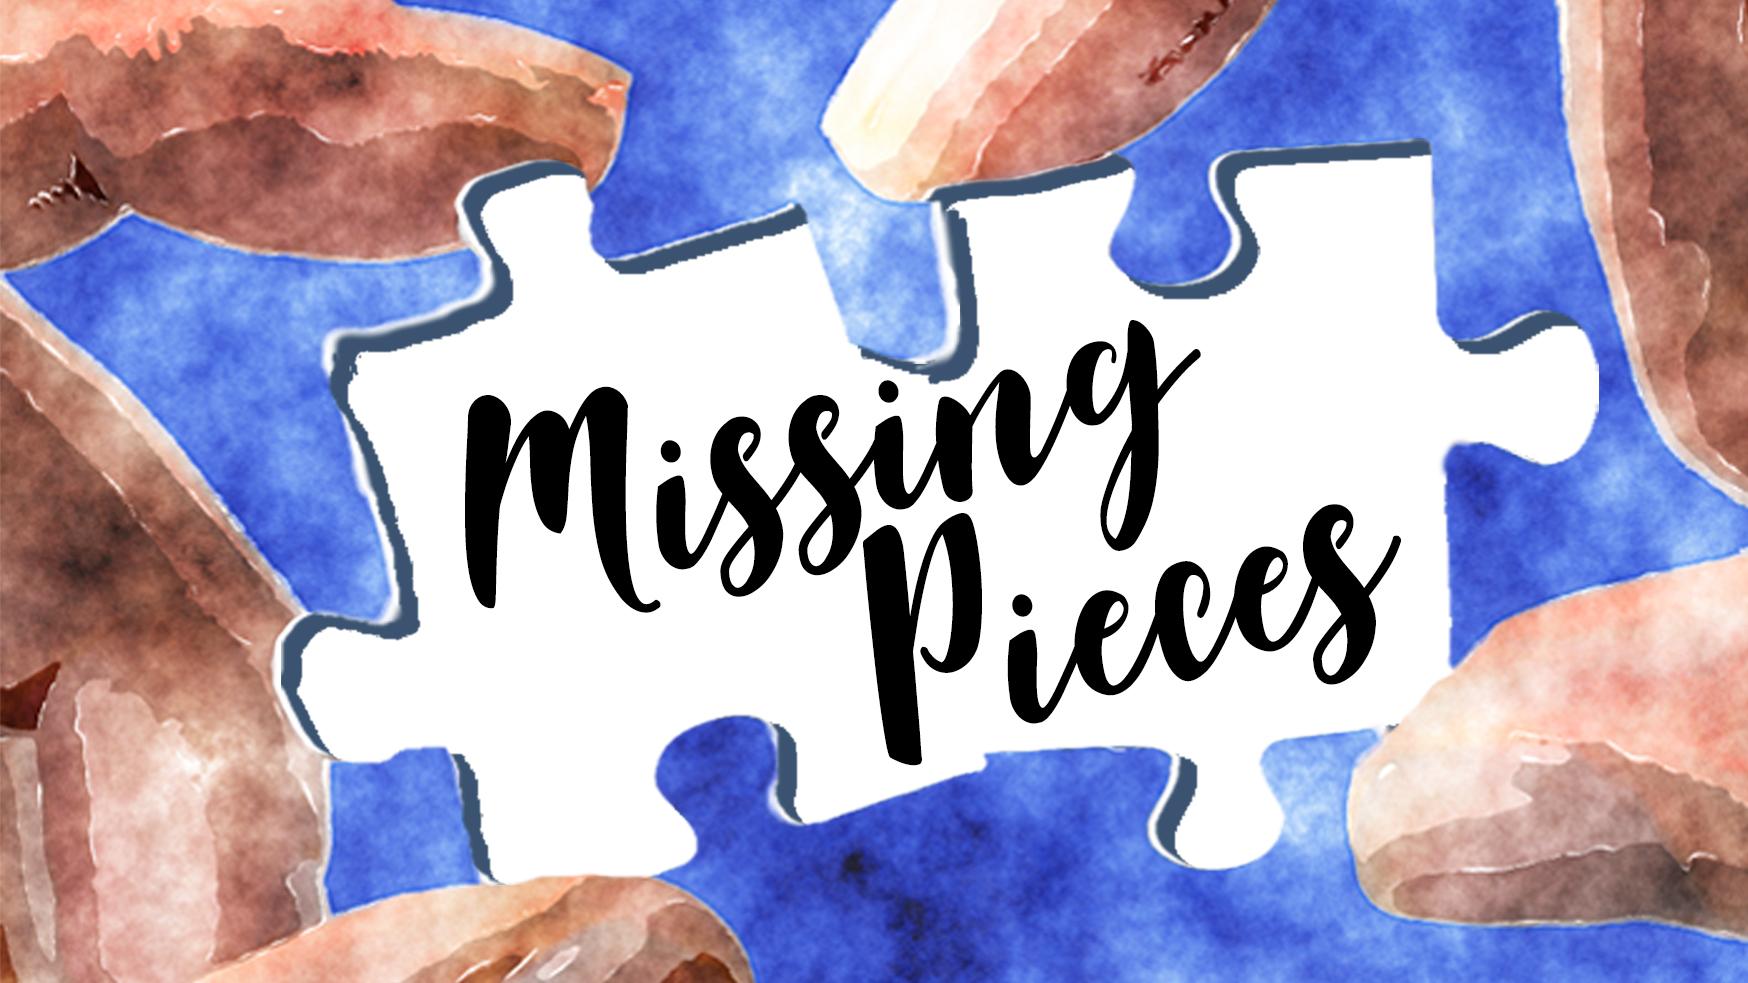 69048_ctk_missing_pieces_screener_1920x1080 (1)